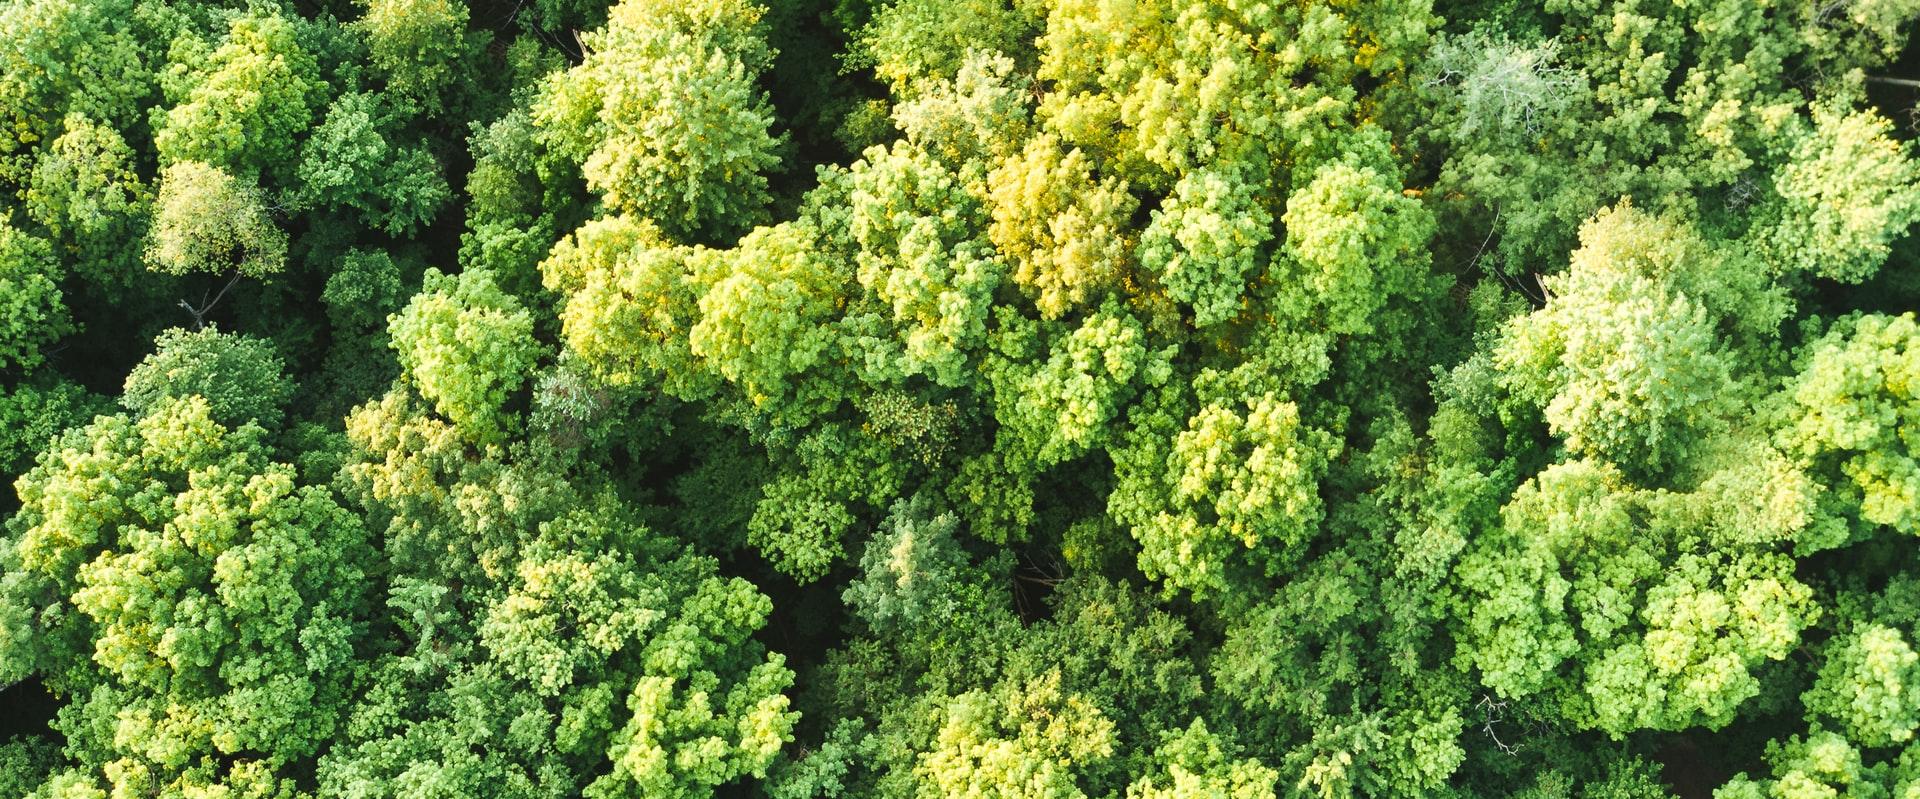 Baumkronen Luftbild